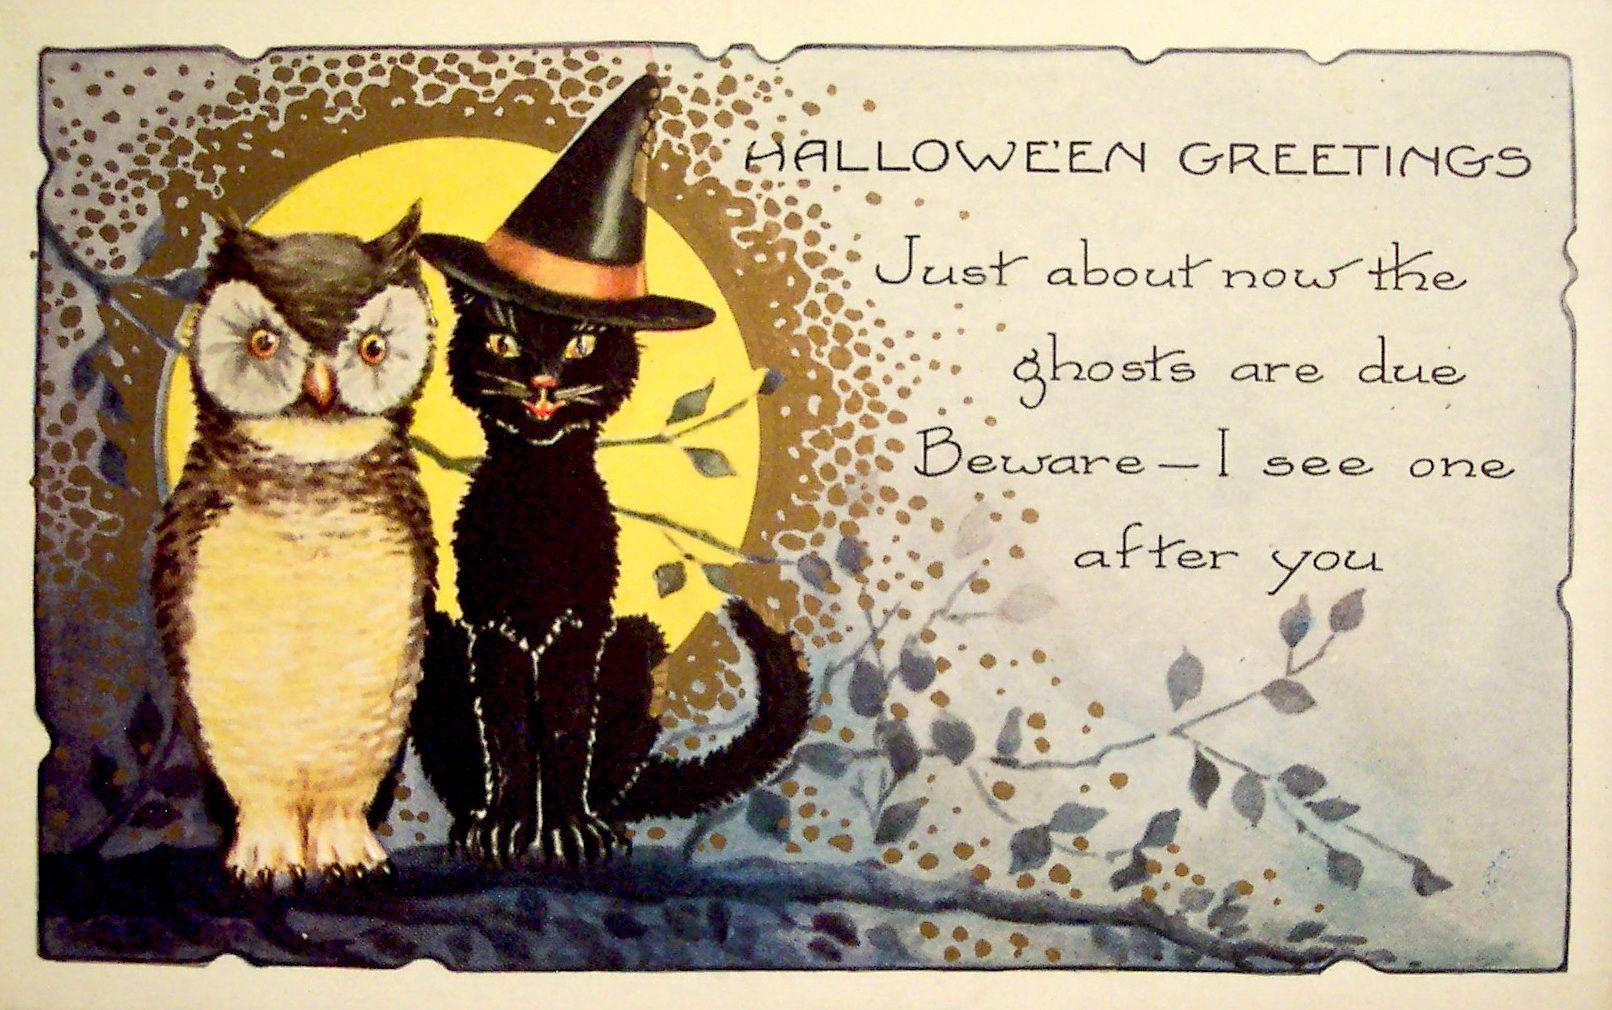 Free vintage halloween i halloween e card free vintage halloween i m4hsunfo